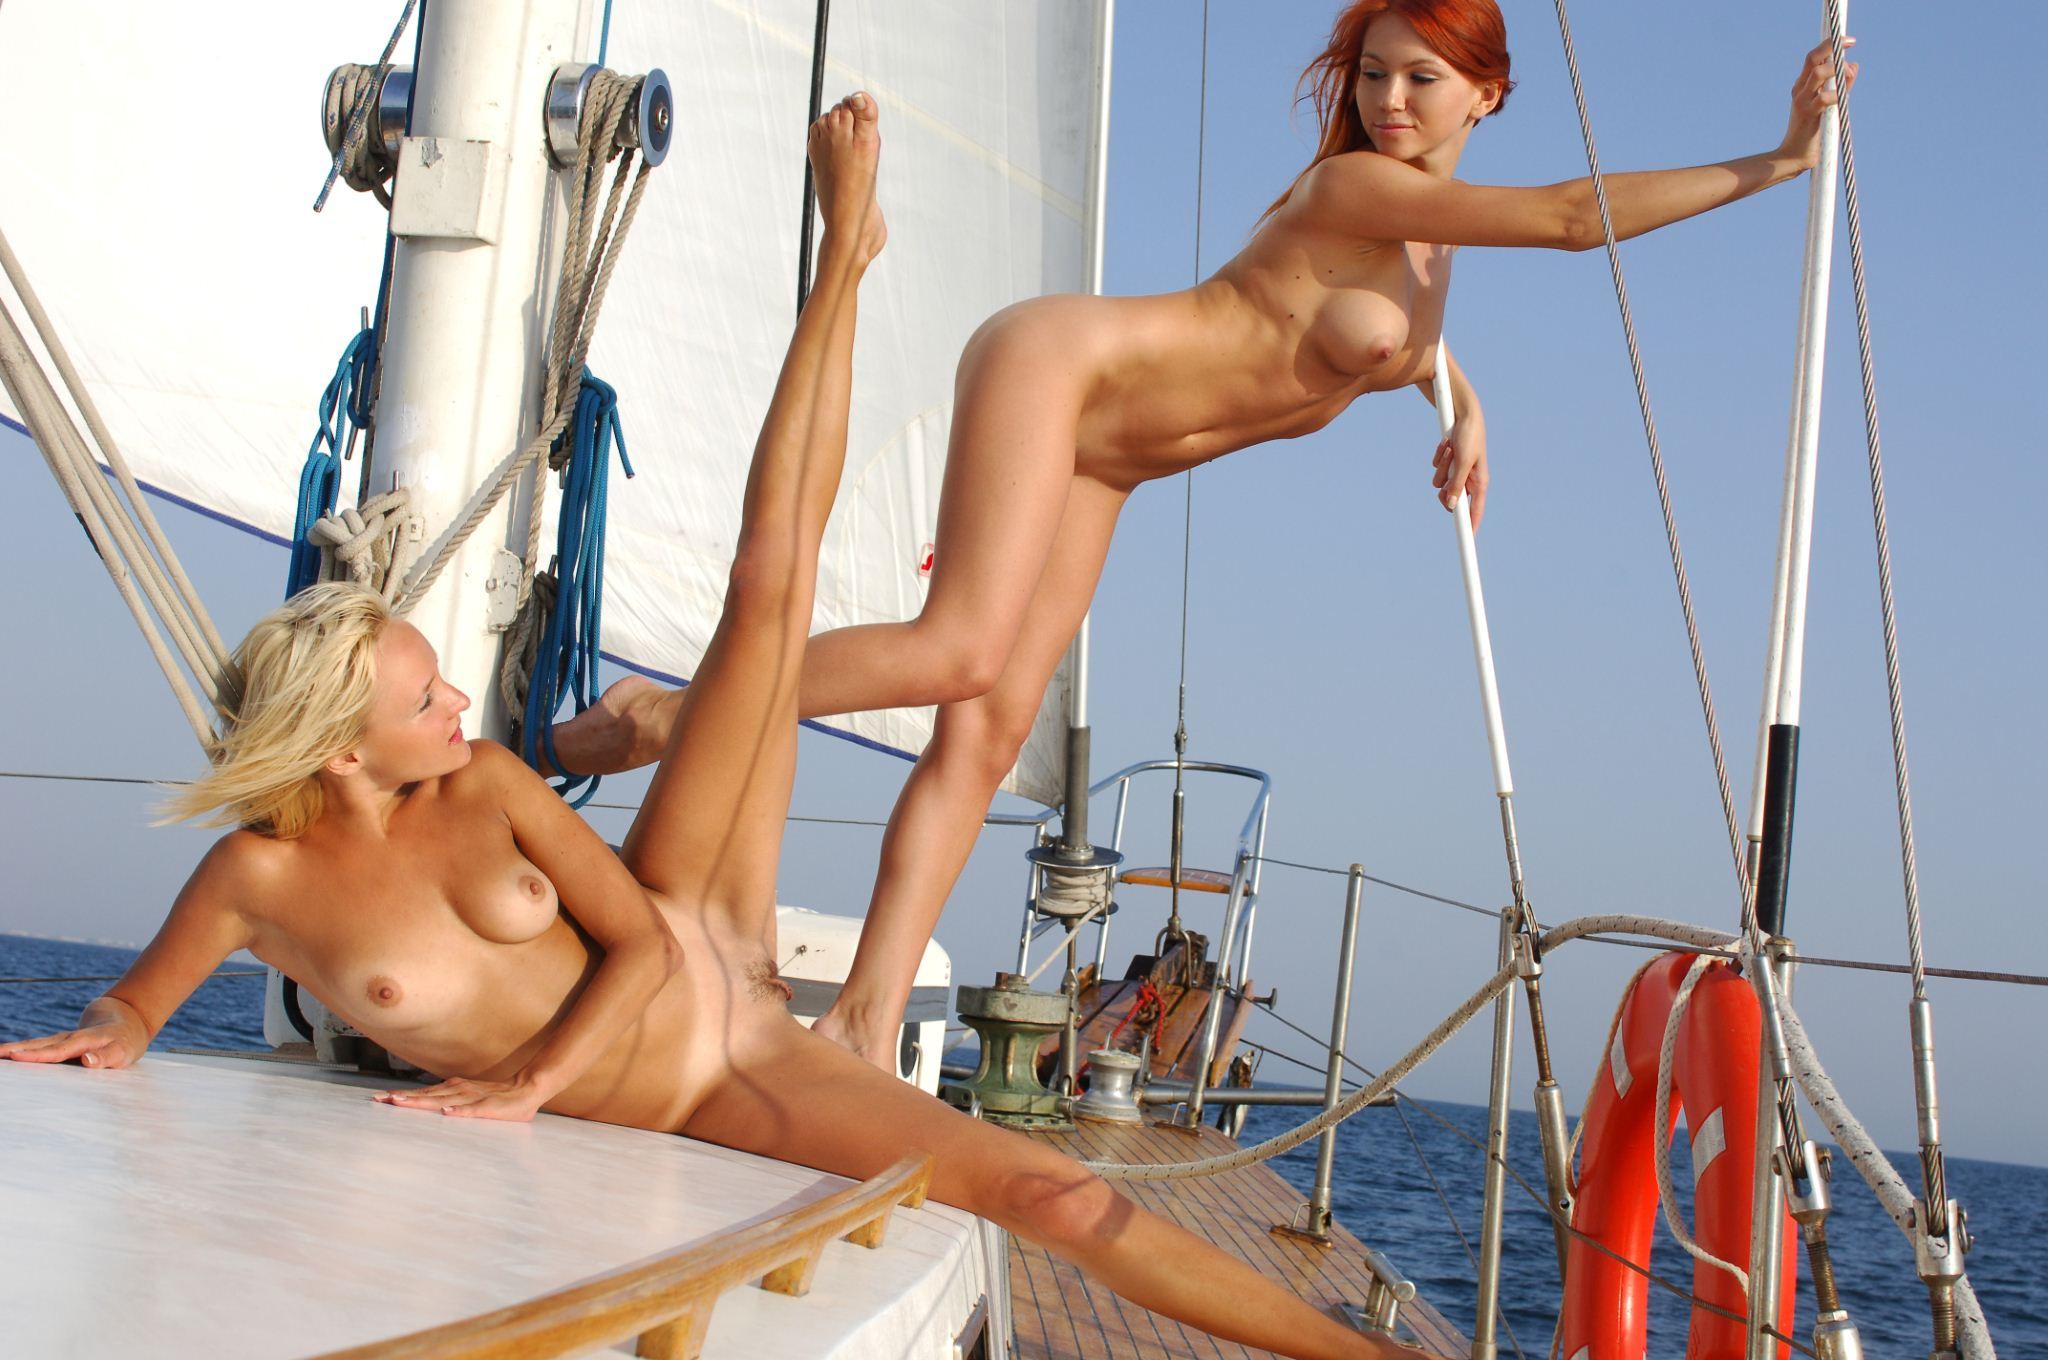 Эротика видео яхта массаж #7